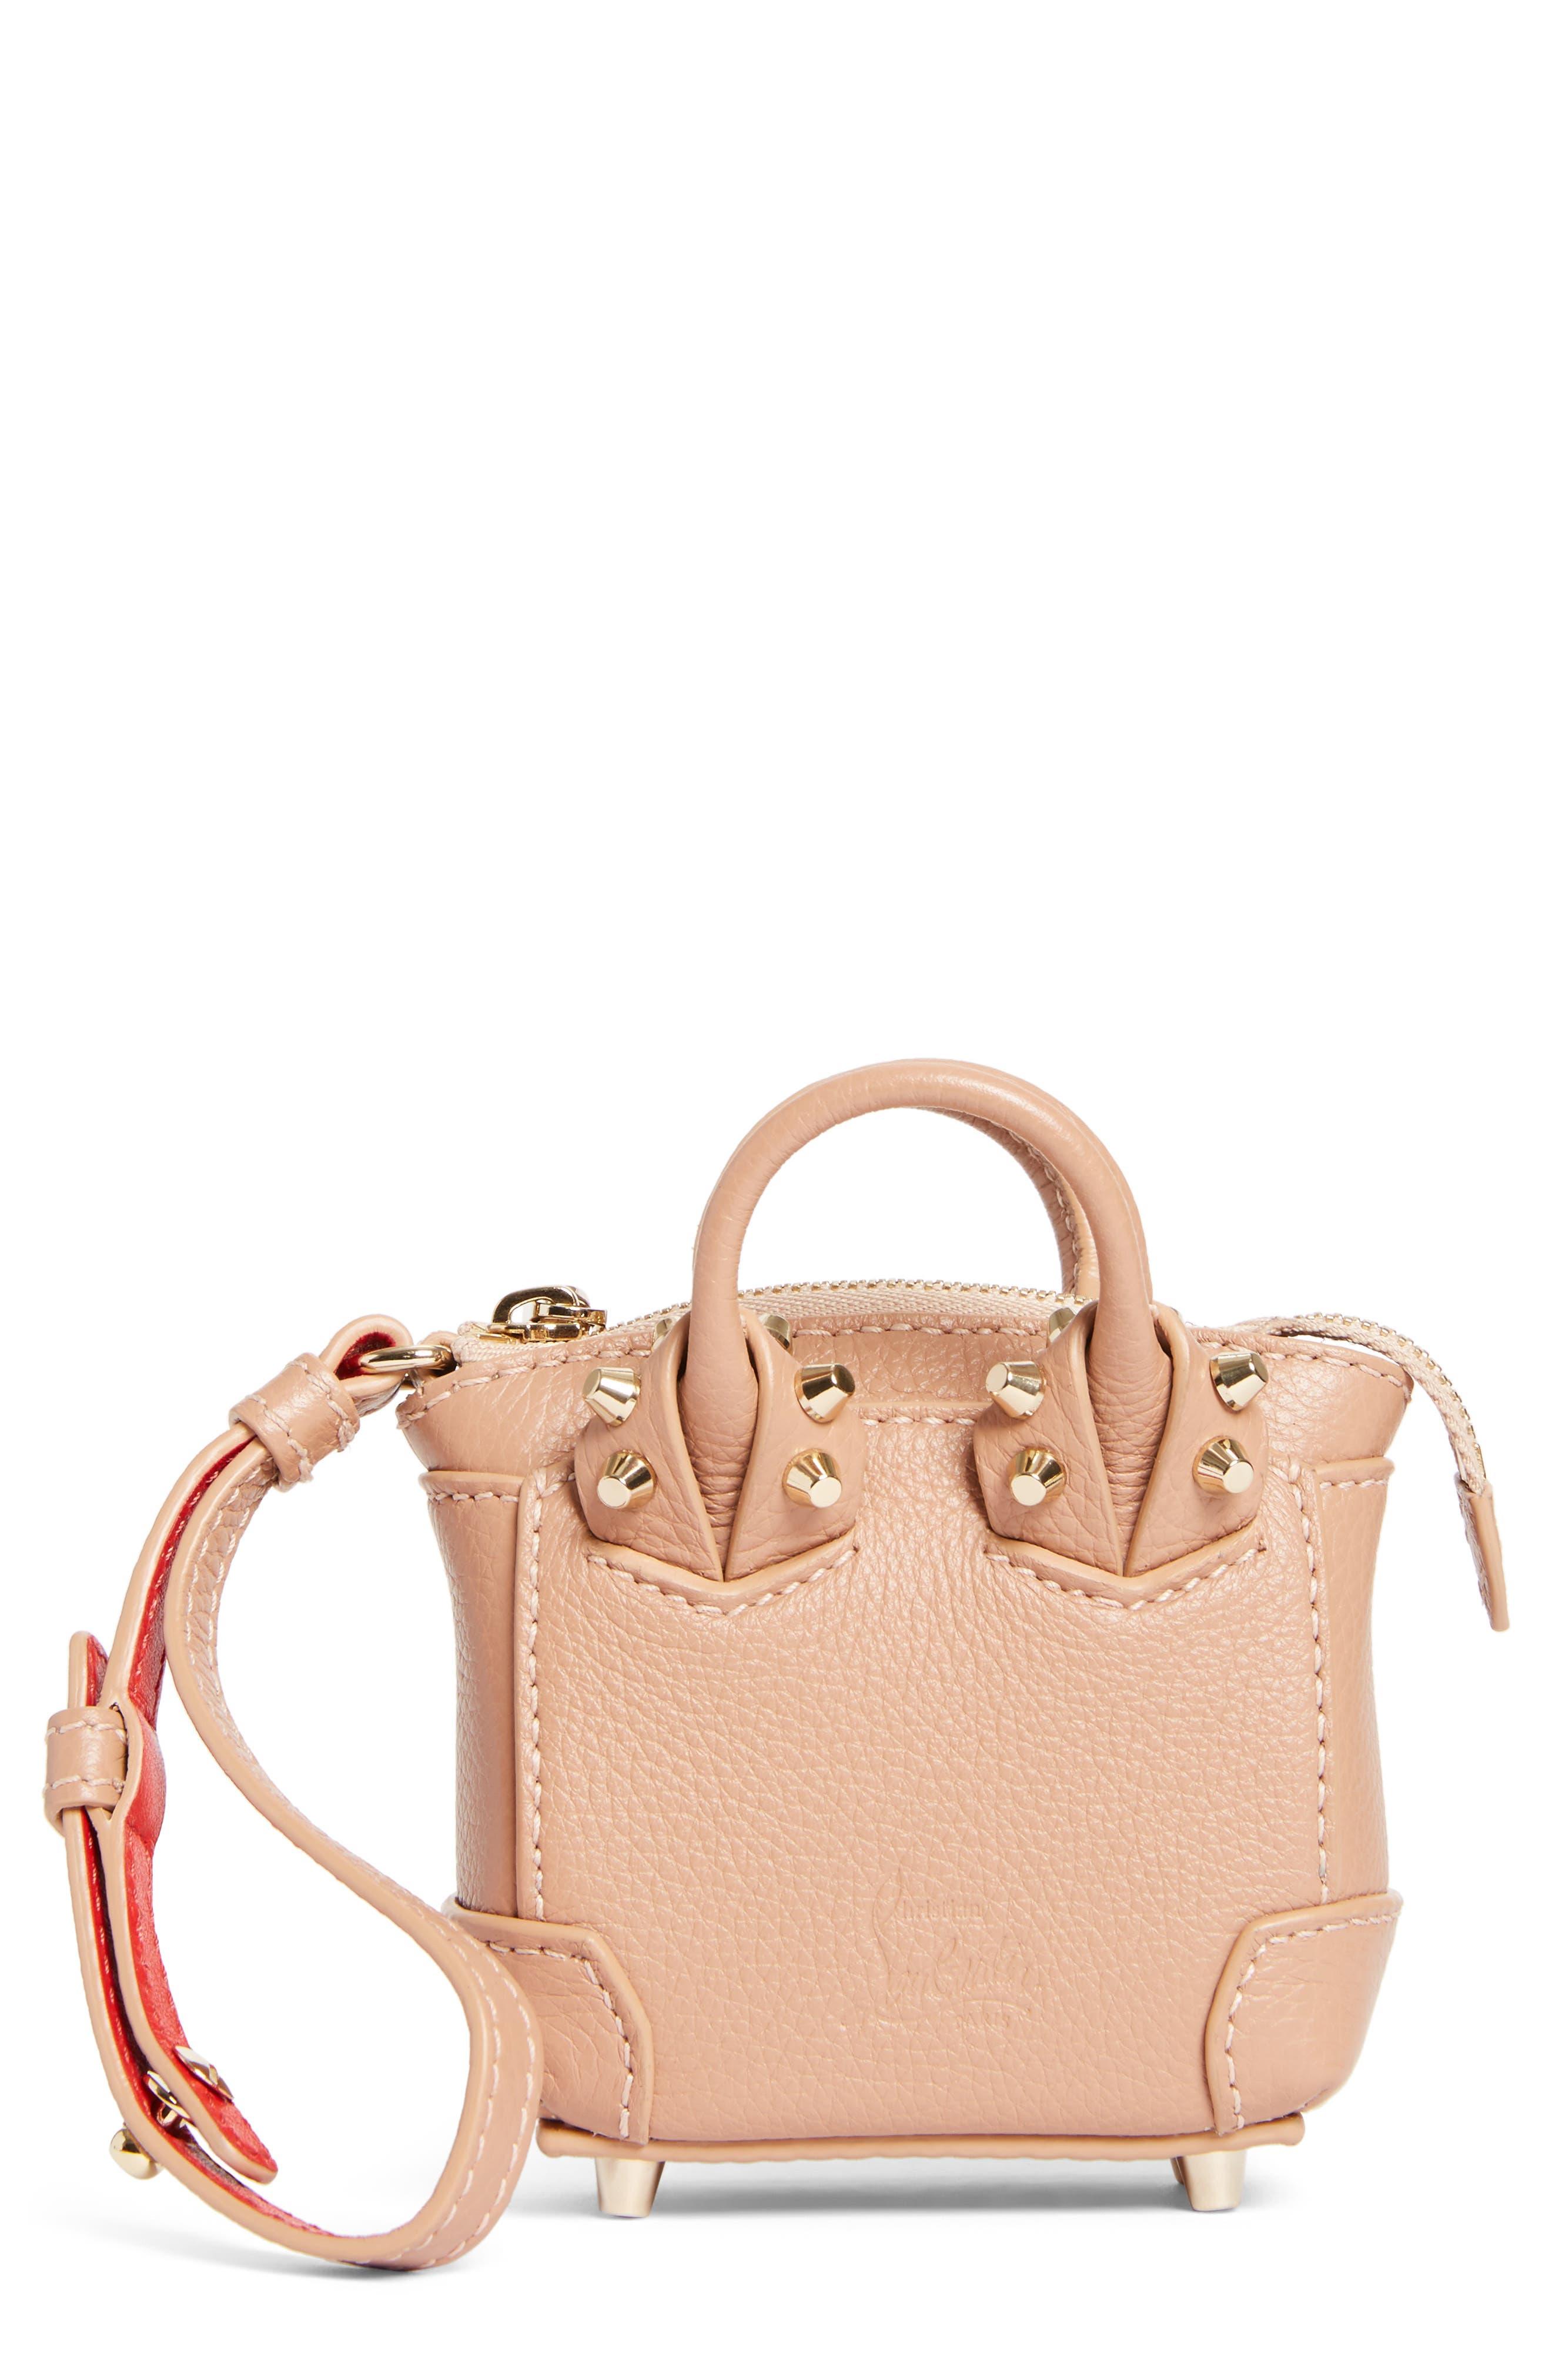 Eloise Mini Leather Bag Charm,                         Main,                         color, Nude/ Gold